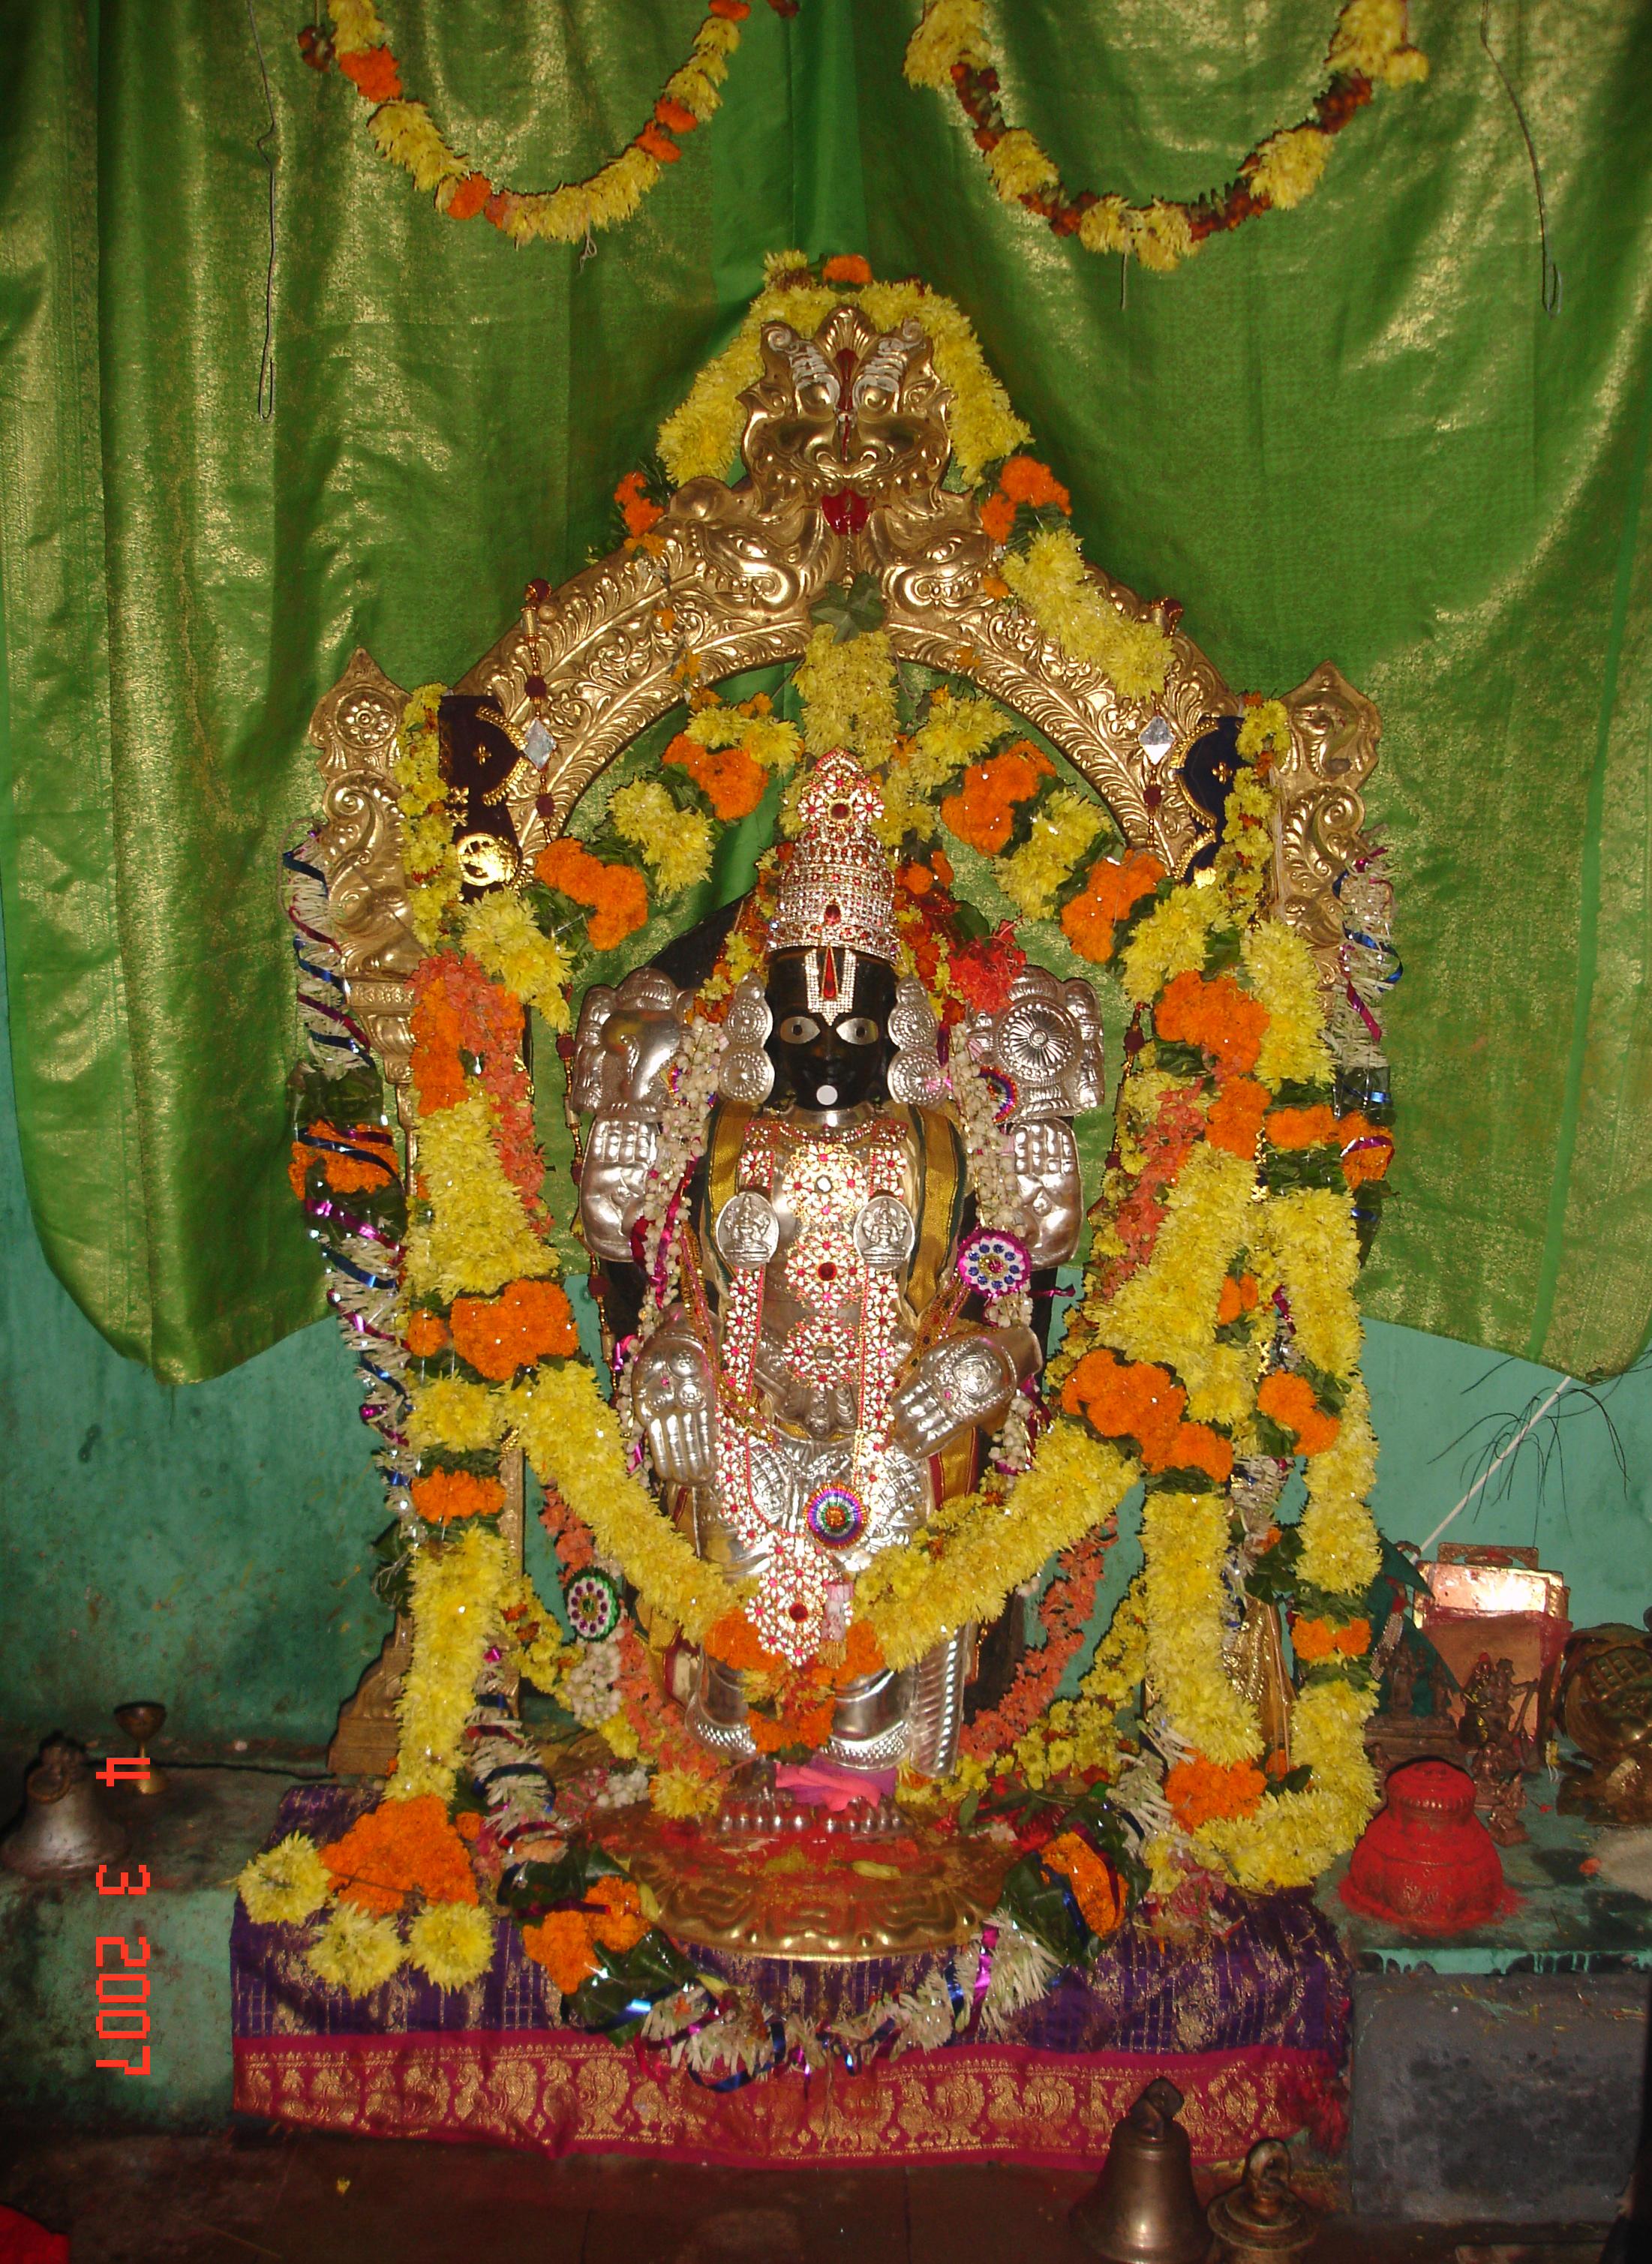 Hindu Gods & Goddesses Full HD Wallpapers & Images